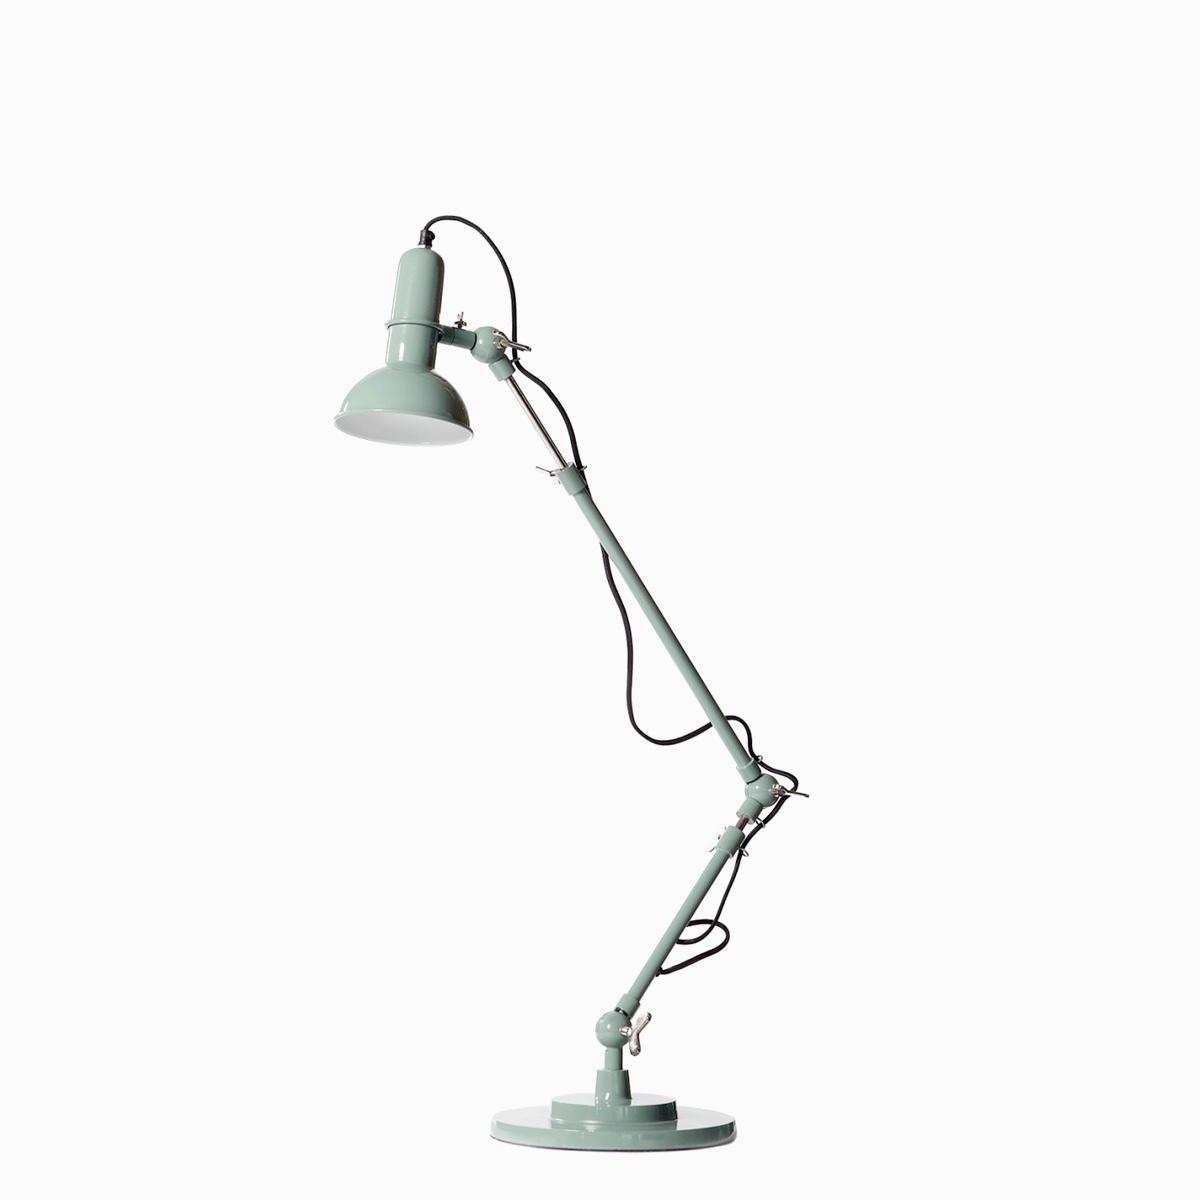 1200x1200 Indu Table Lamp Vintage Green